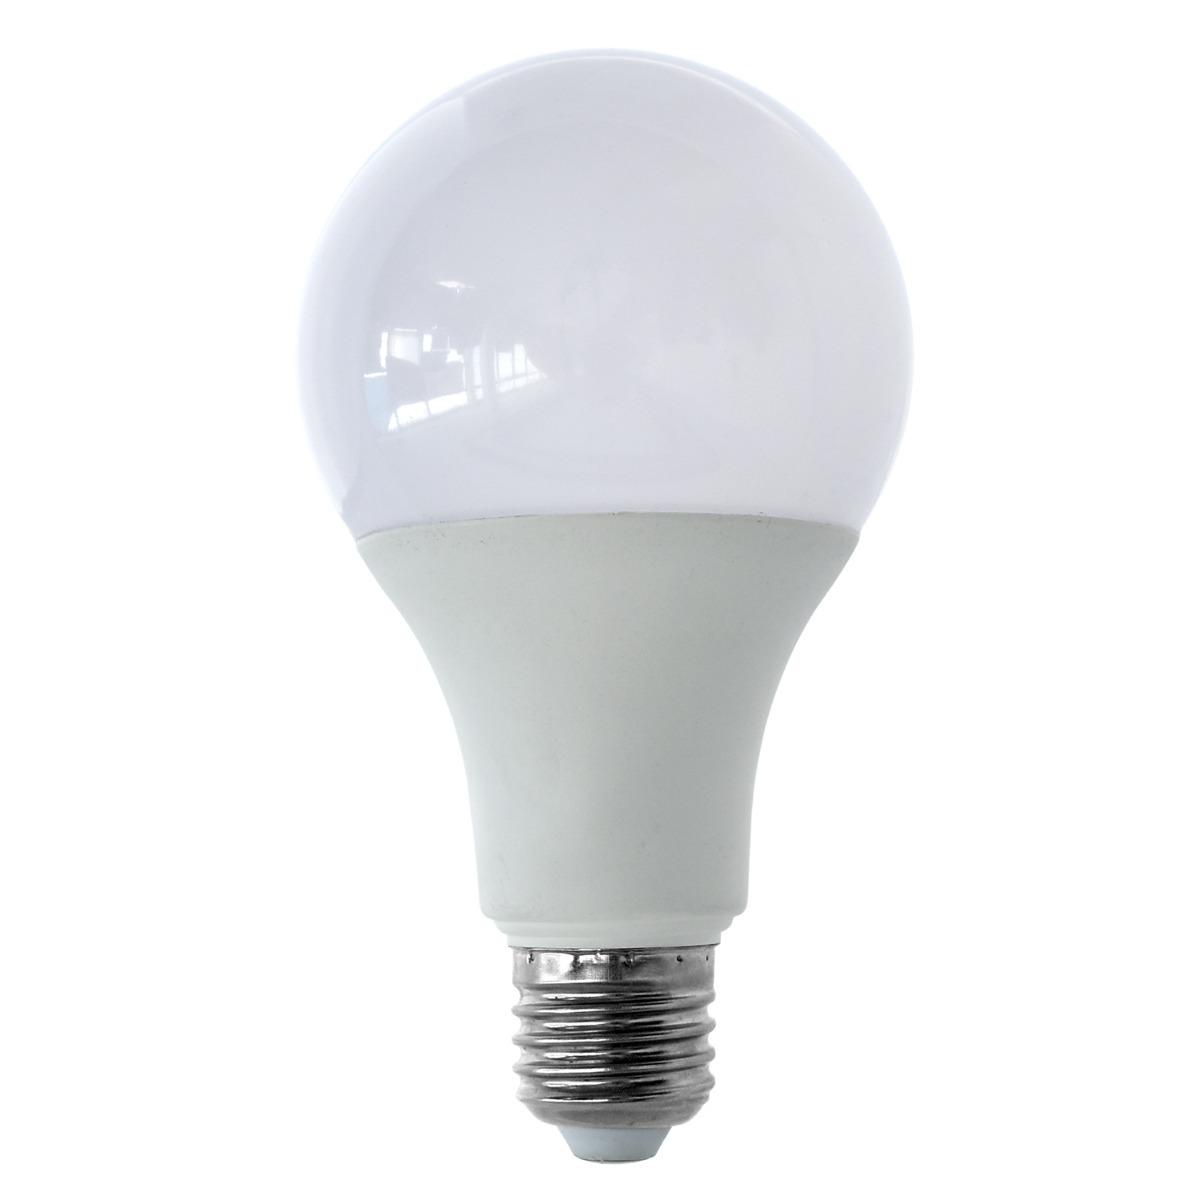 Focos ahorradores led casa luz blanca c lida 7w 490lm e for Luz blanca o calida